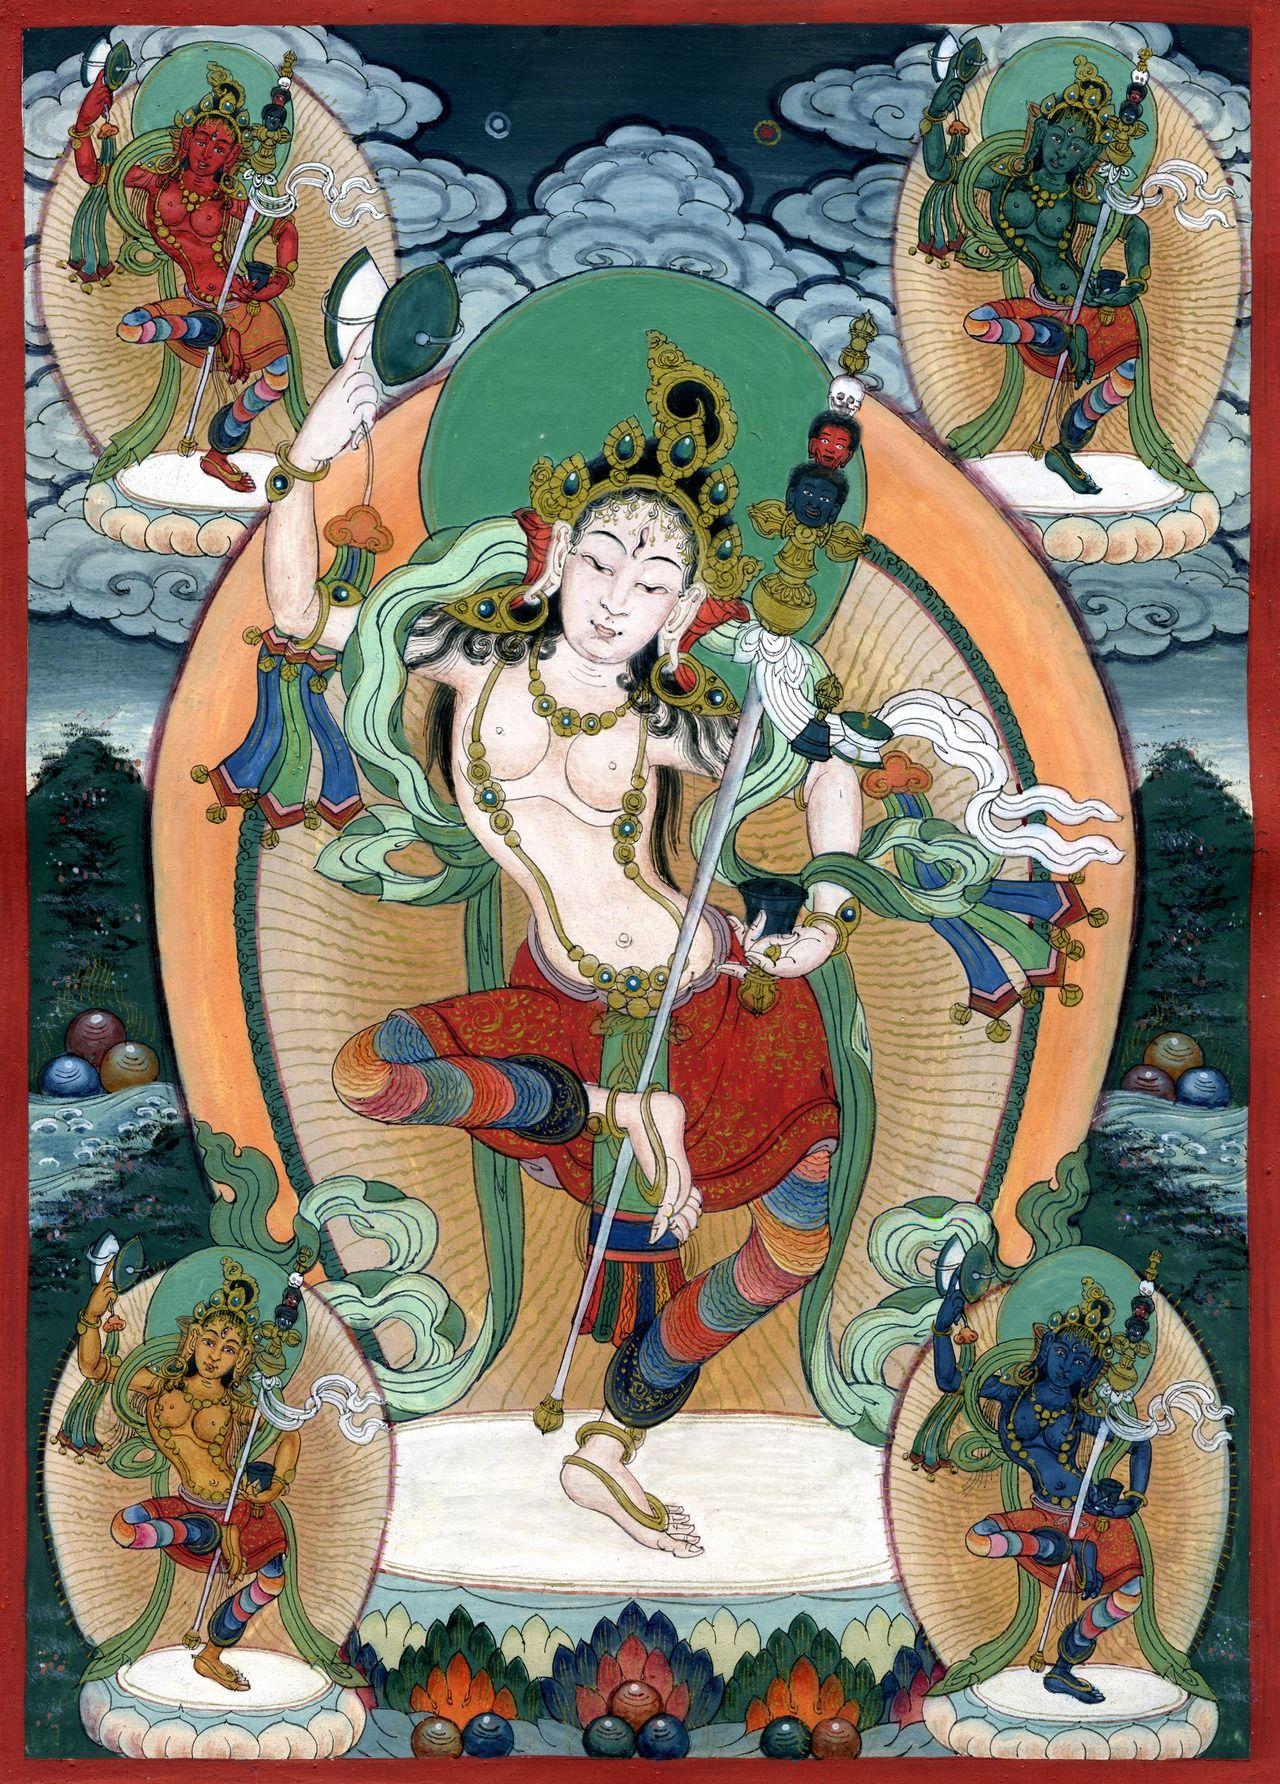 Machig labdron the dakini of chod buddha images pinterest buddha fandeluxe Image collections